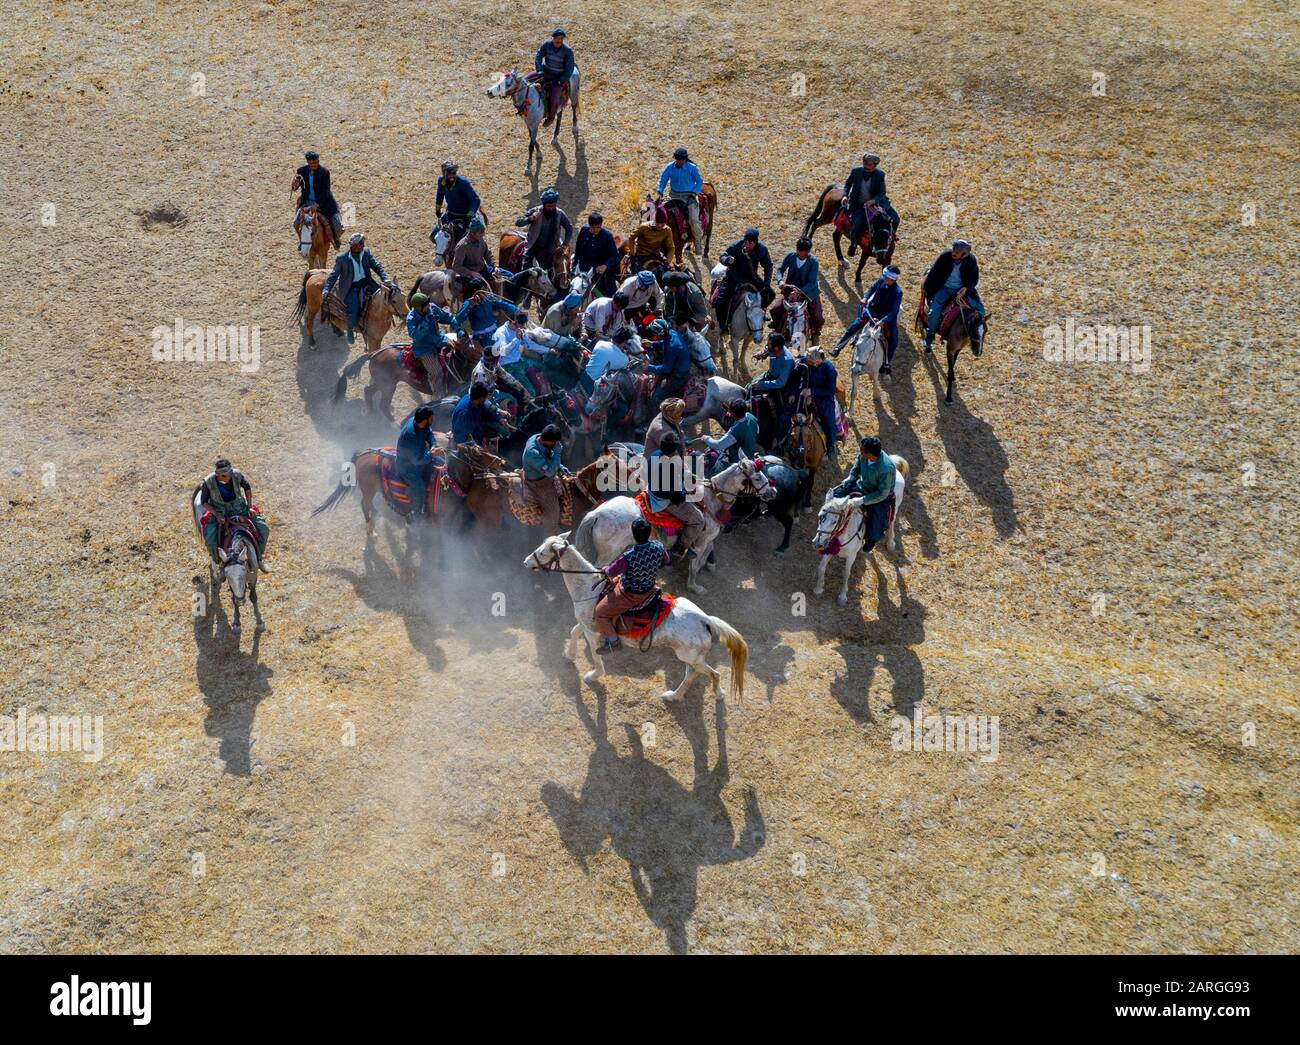 Aerial of a Buzkashi game, Yaklawang, Afghanistan, Asia Stock Photo